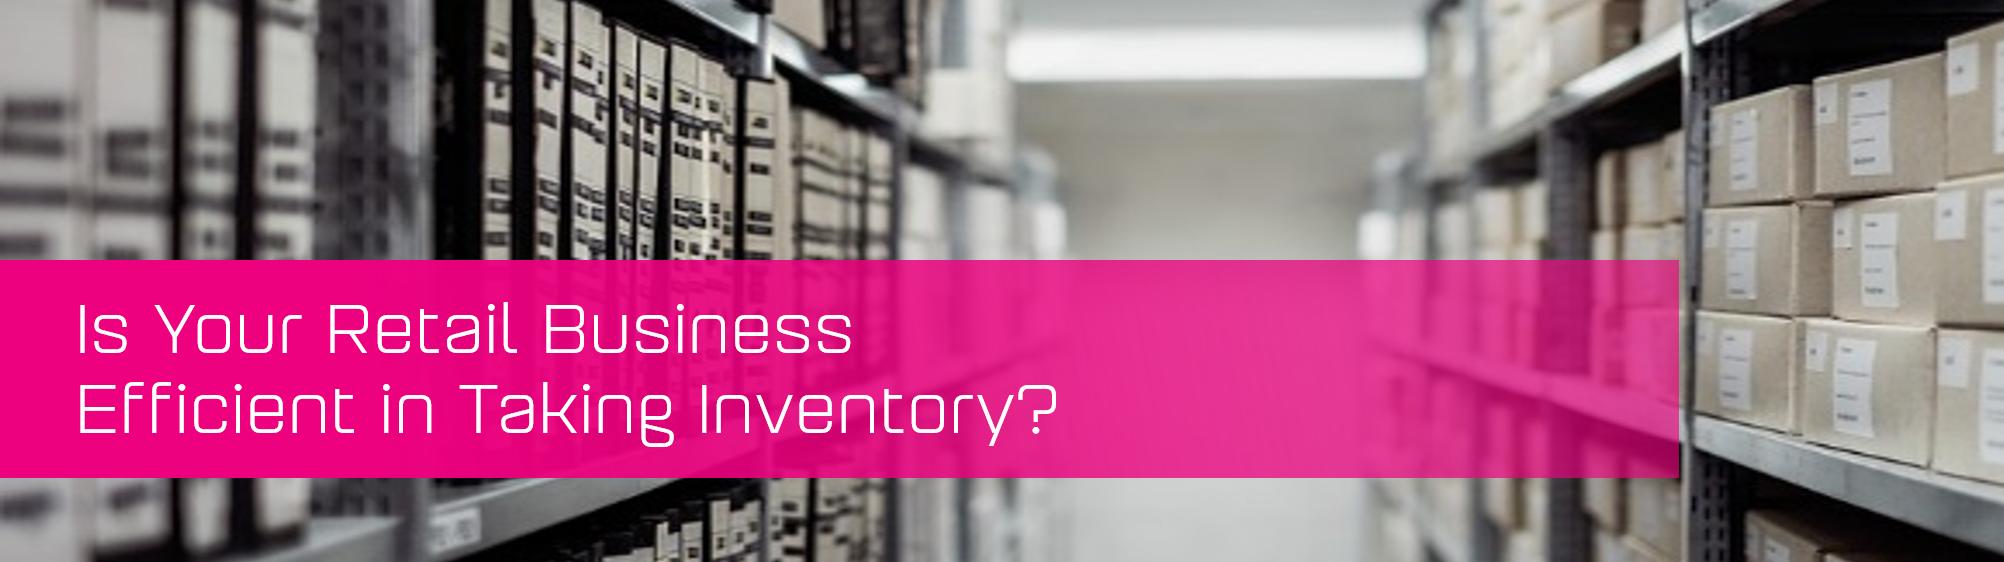 KCS SA - Blog - efficient inventory taking image